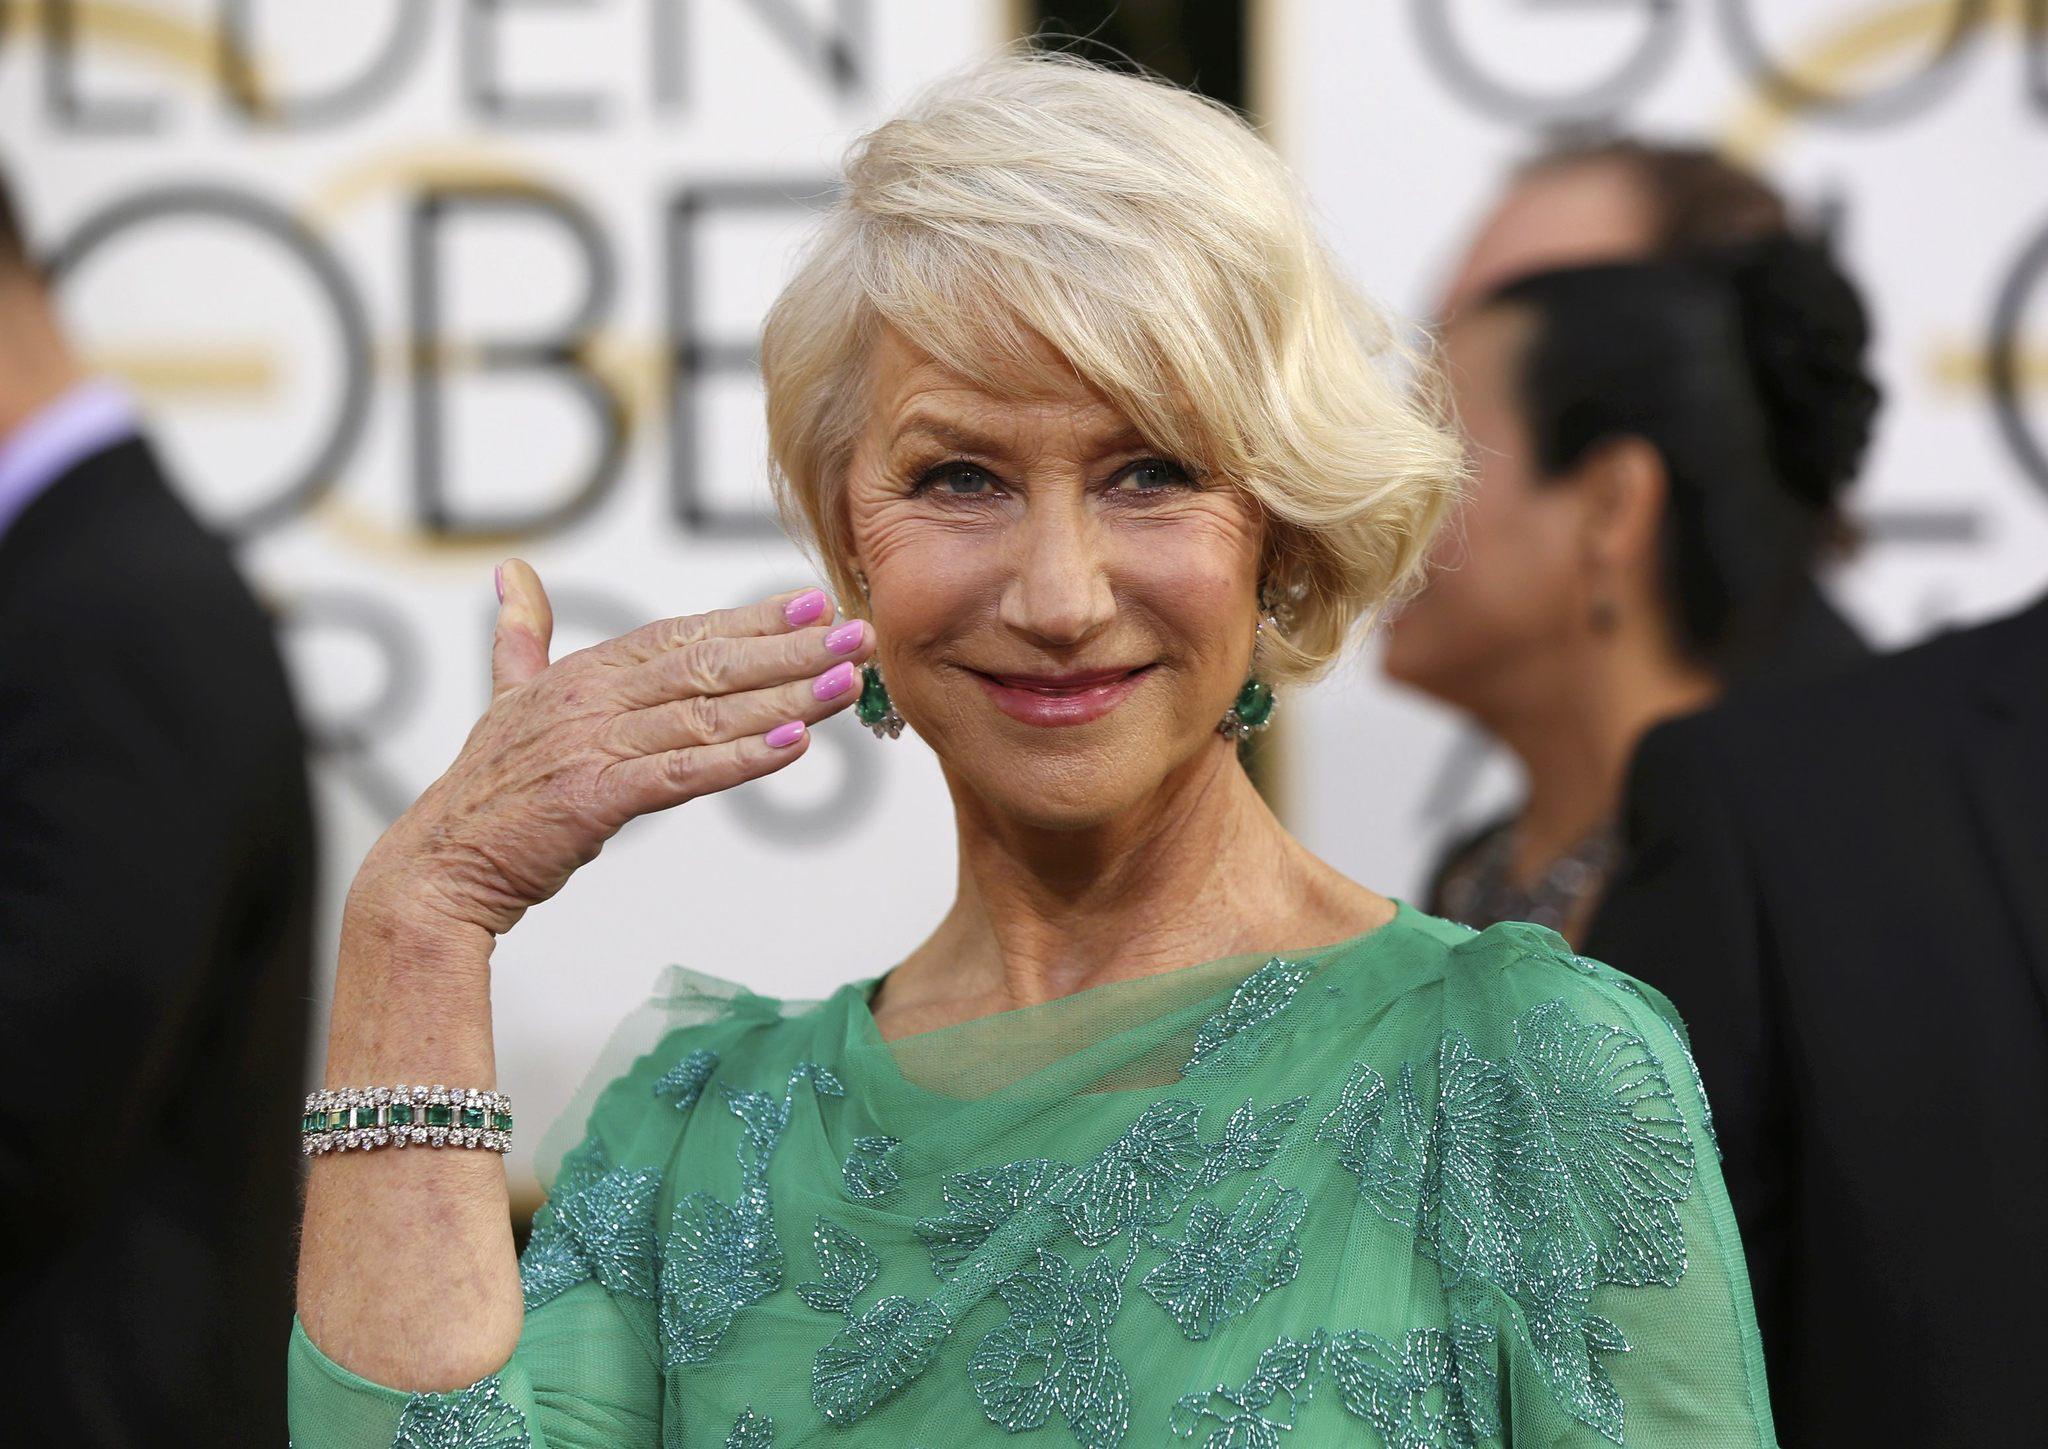 Dame Helen Mirren arrives at the 71st annual Golden Globe Awards.